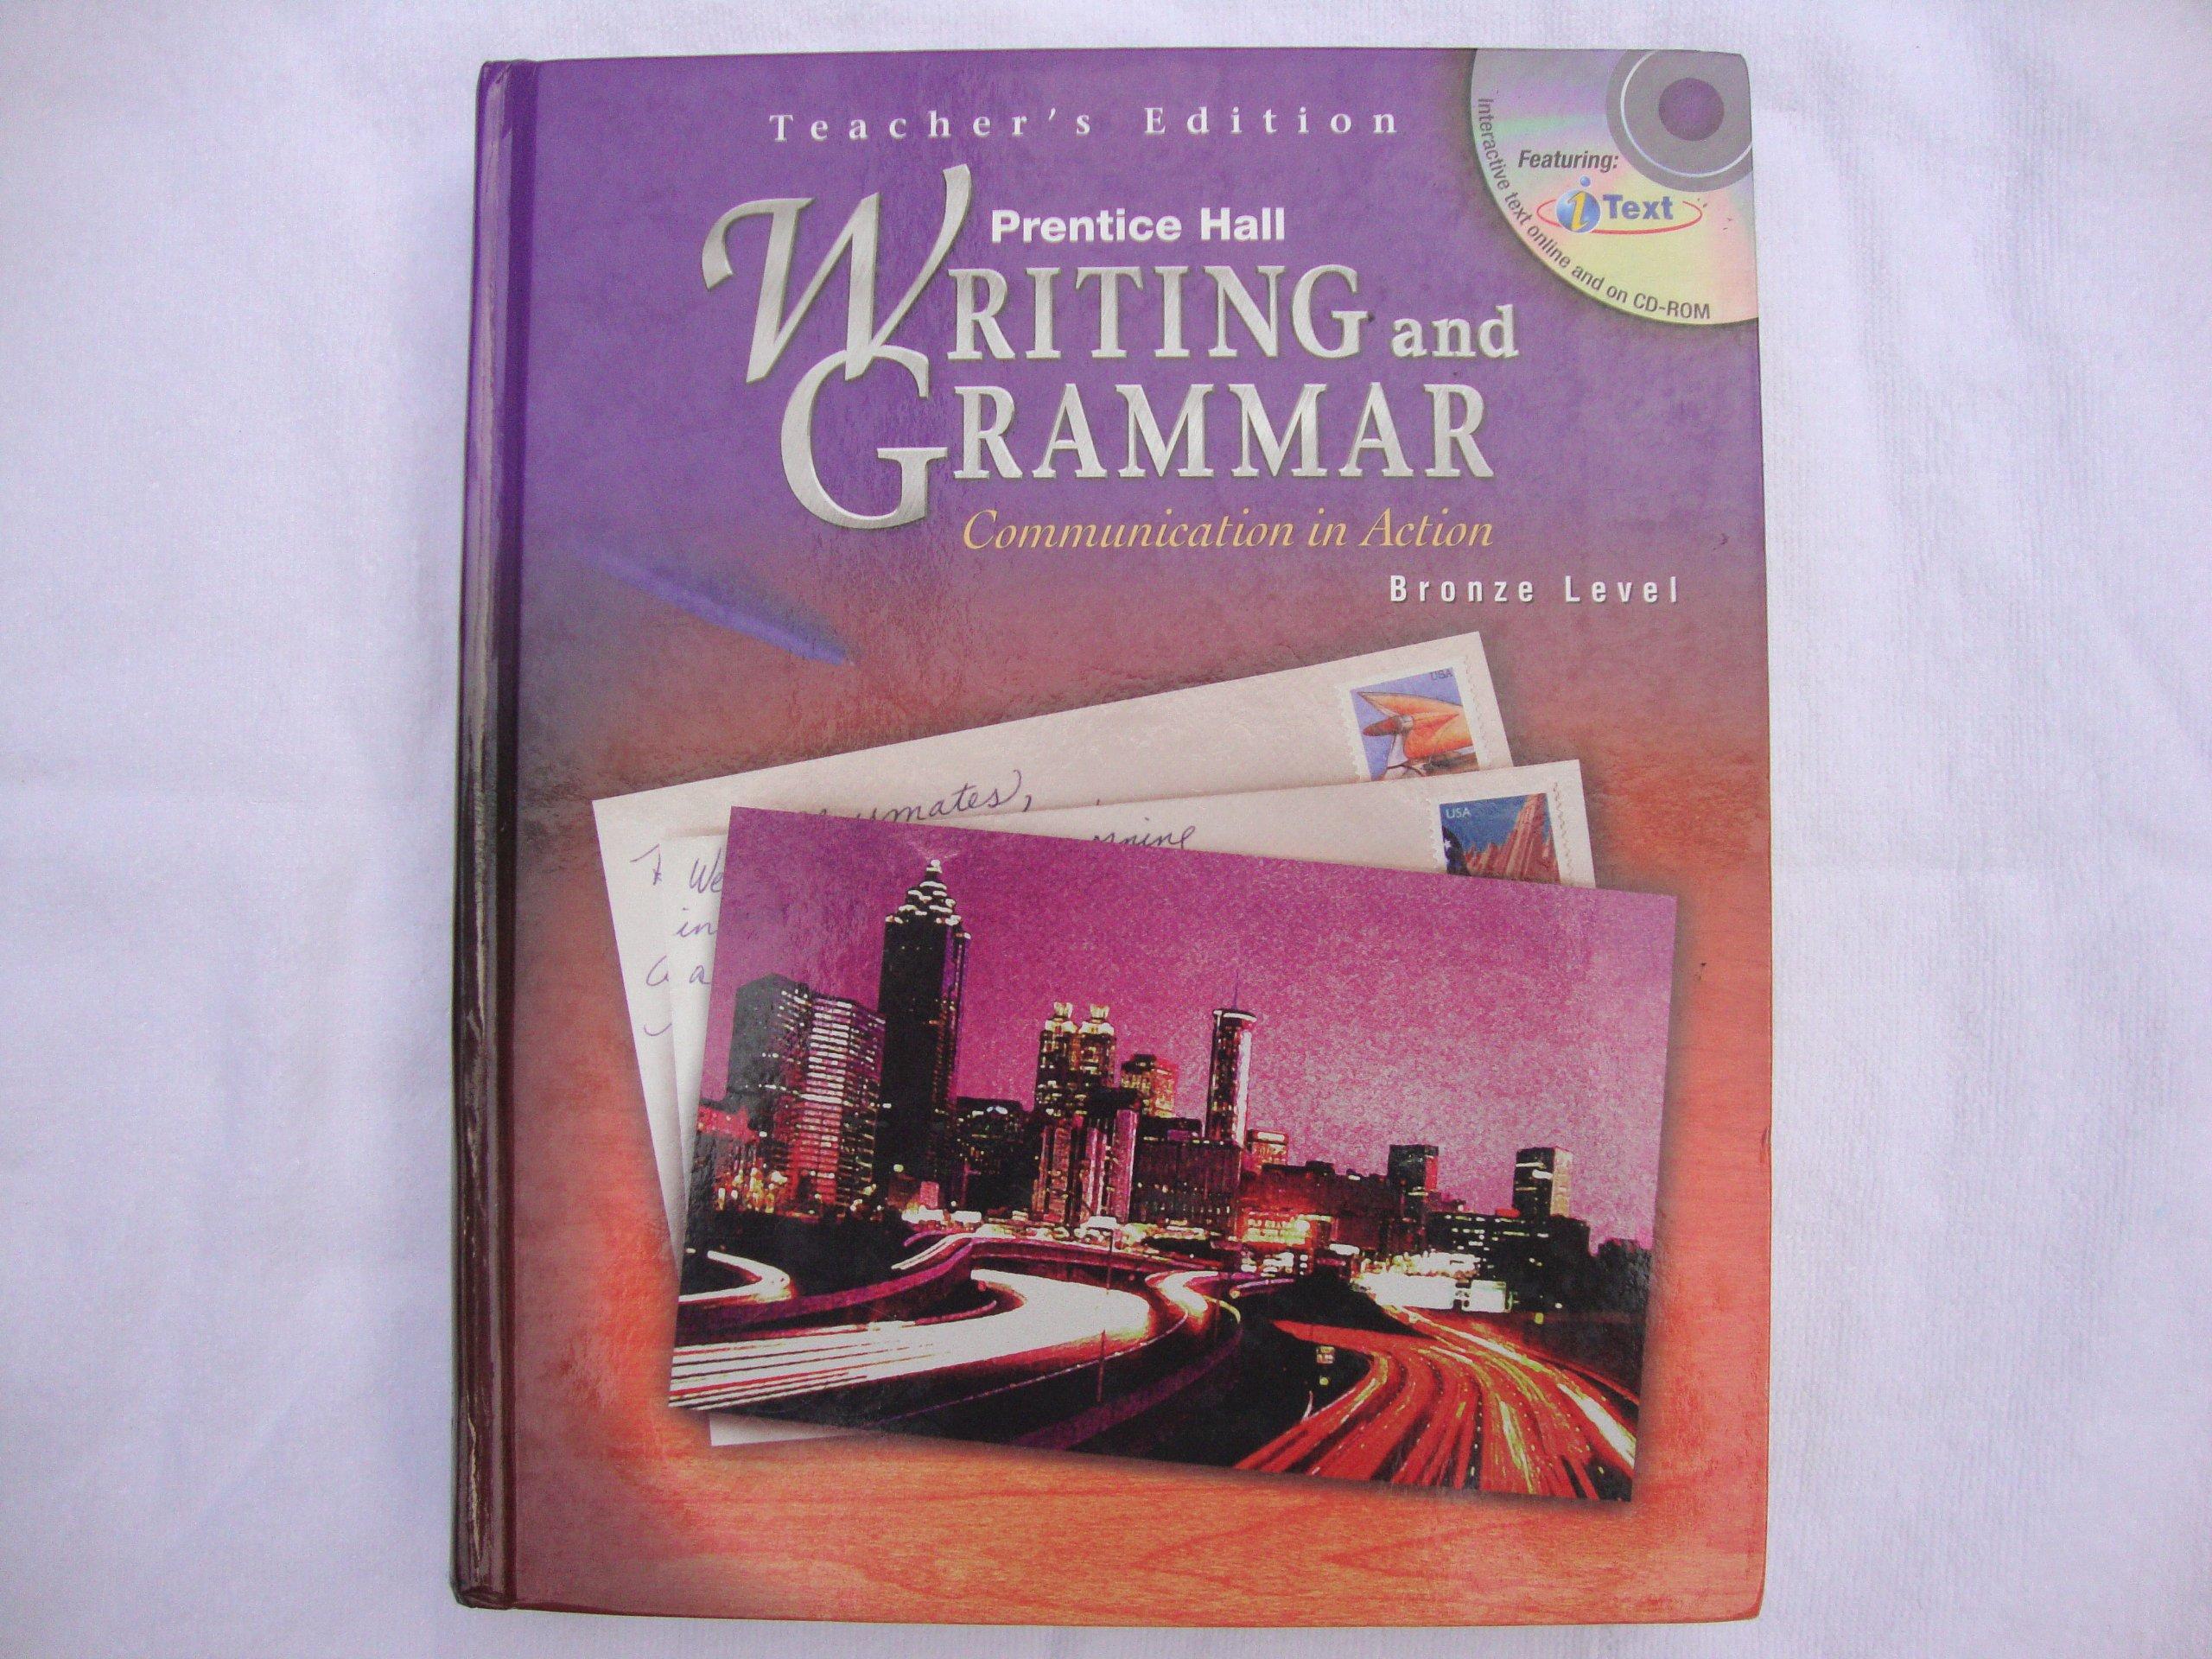 Prentice Hall Writing and Grammar Communication in Action (Teacher's Edition,  Bronze Level Grade 7): Carroll: 9780130374974: Amazon.com: Books